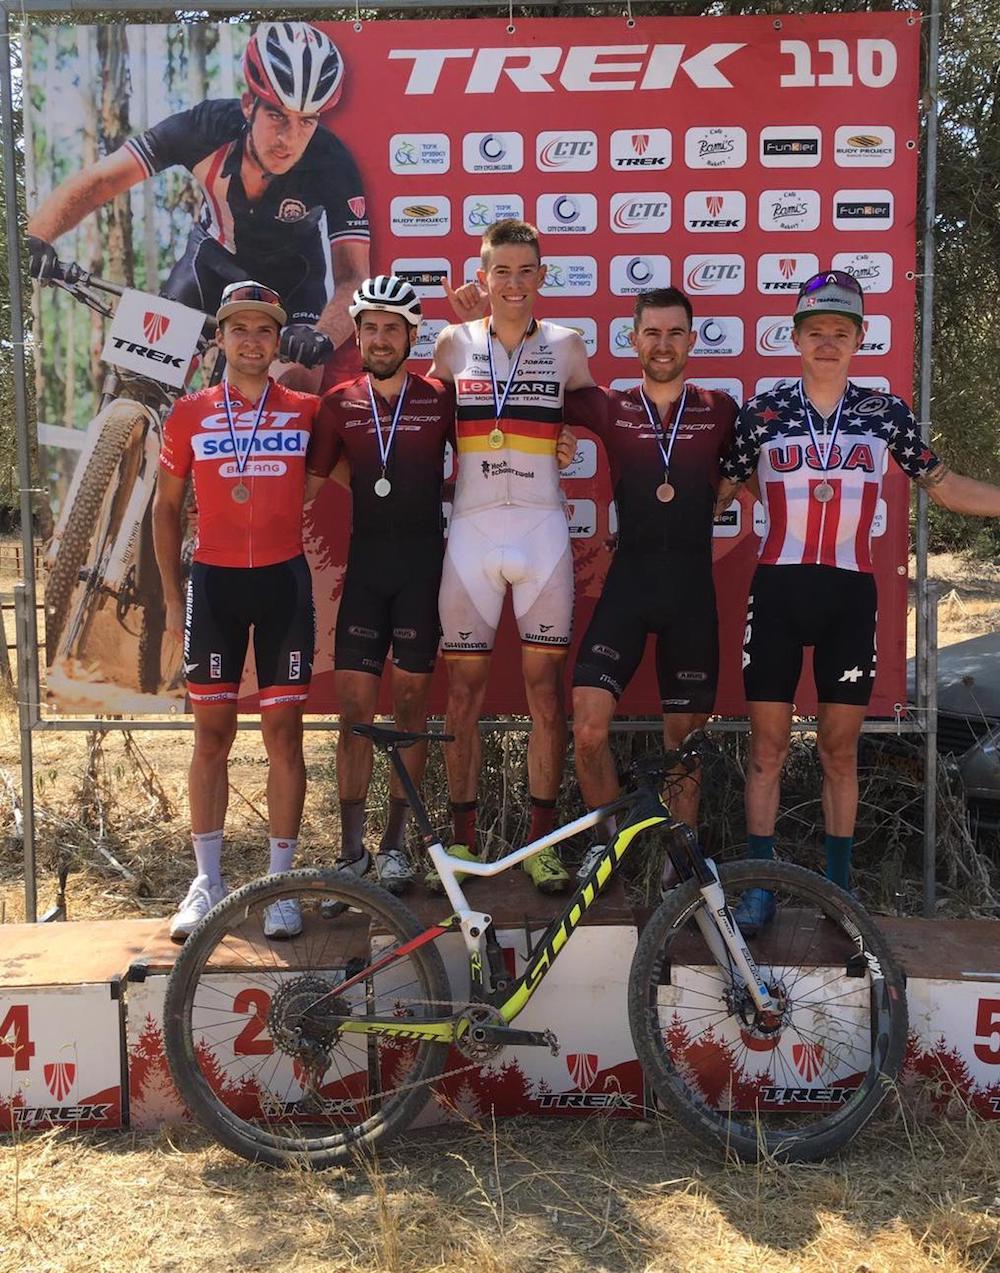 Blums_Giger_Brandl_Gluth_Swenson_Israel_c1_podium_by Marc Schaefer